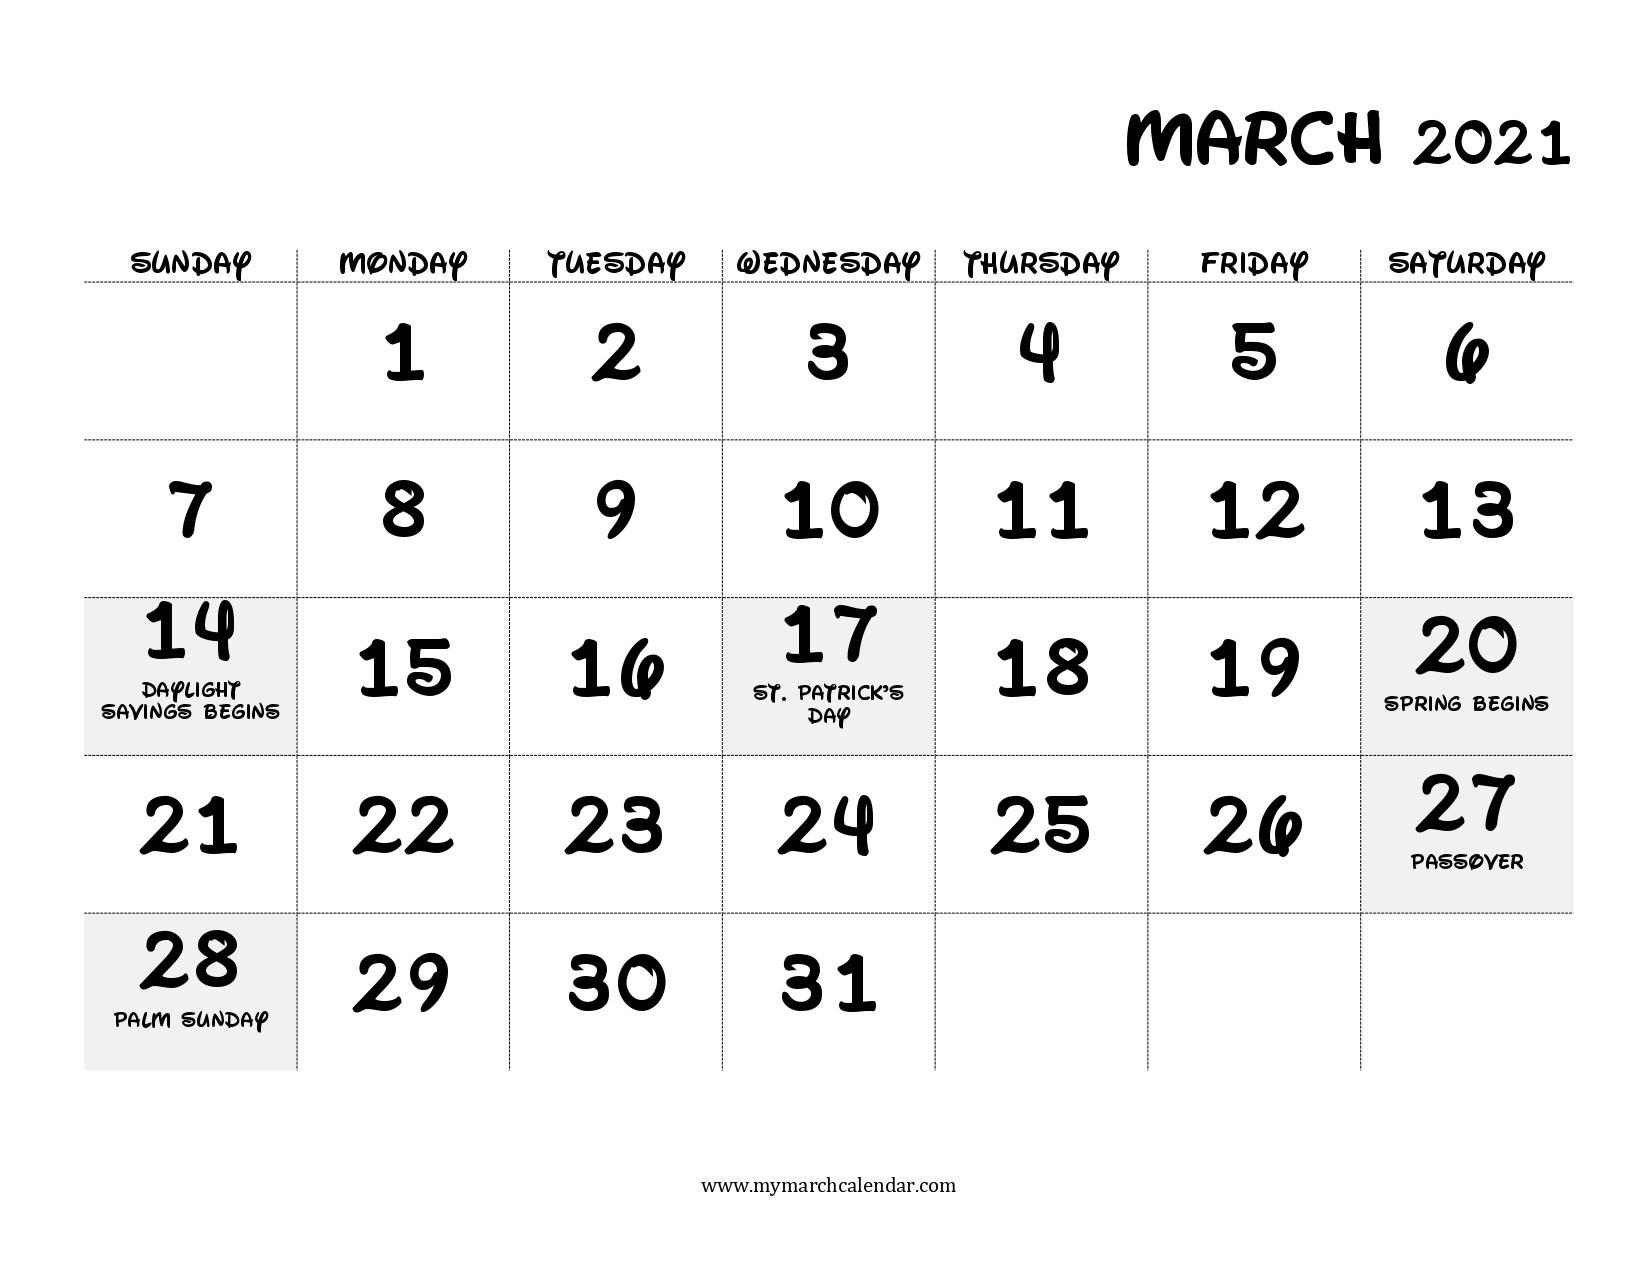 35+ March 2021 Calendar Printable, March 2021 Calendar Pdf  Printable March 2021 Calendar Pdf